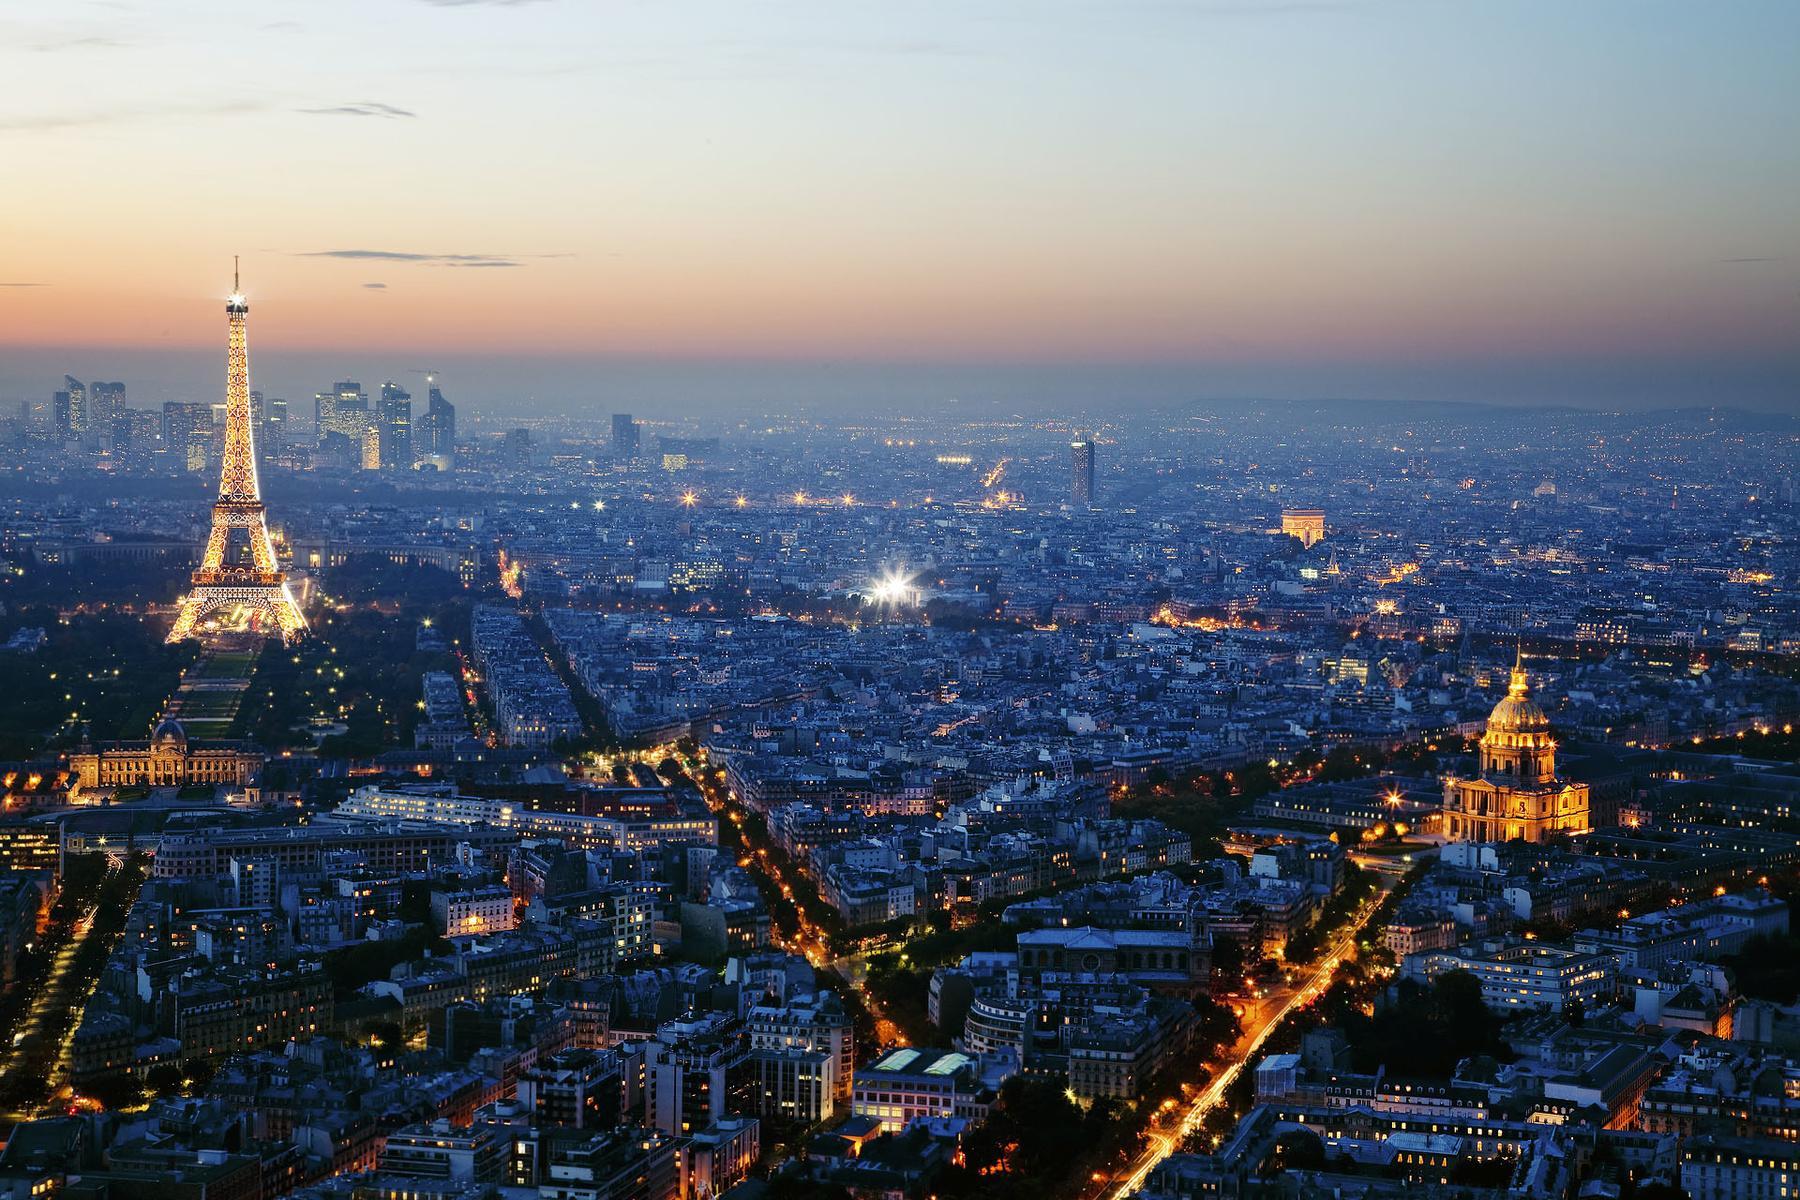 32358-1639355-2009_10_28_Paris_Day_4-210.jpg